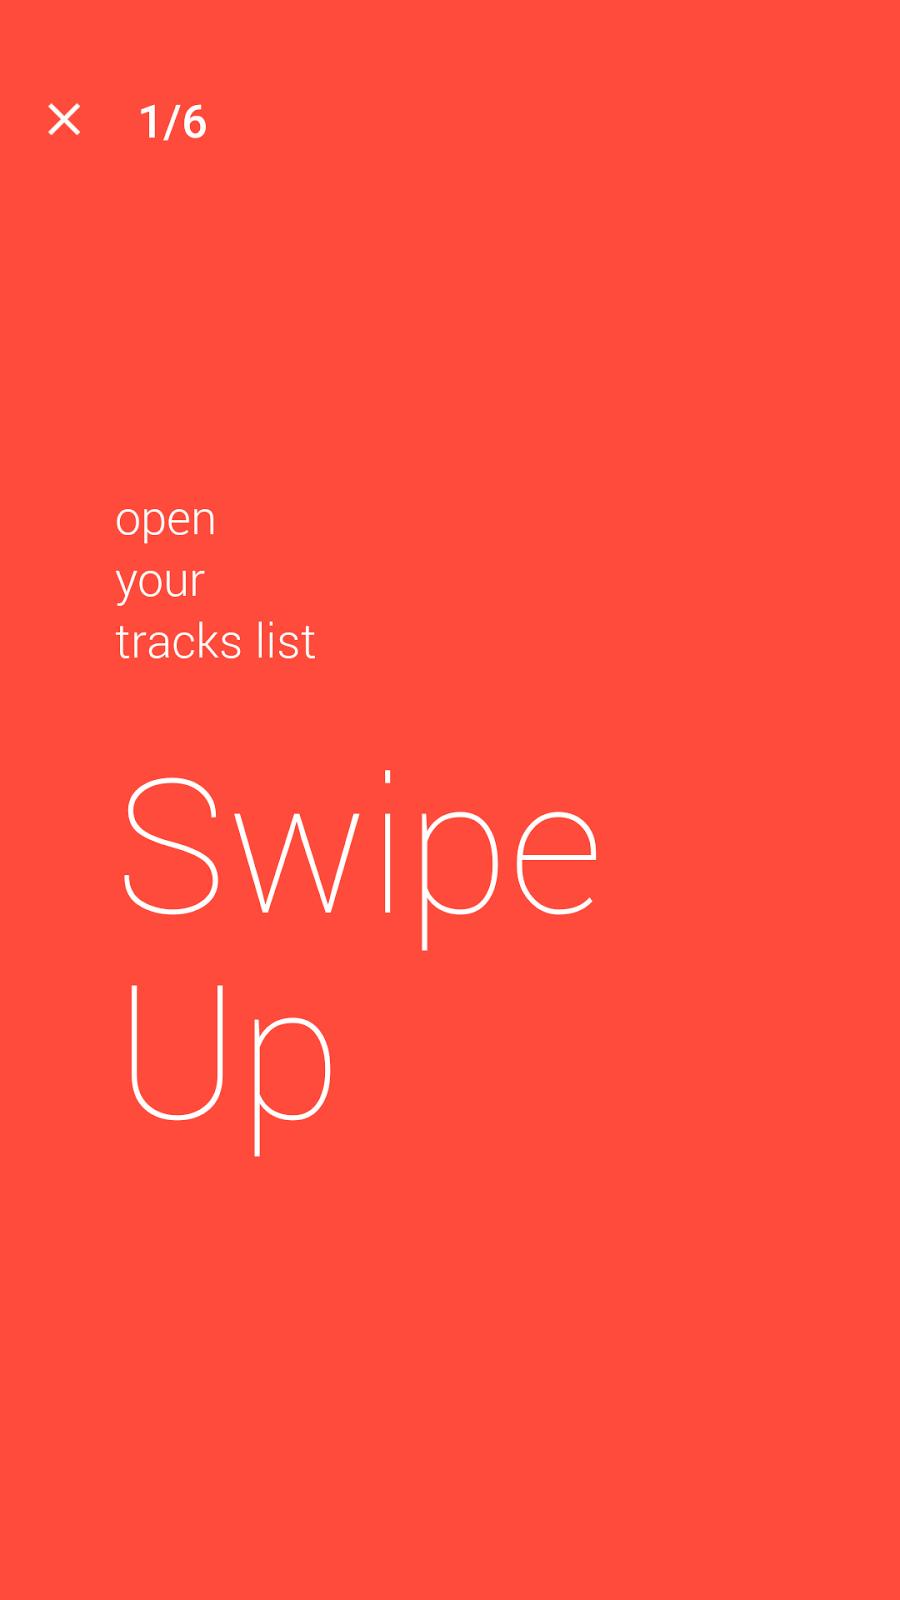 Swipe Up to see track list